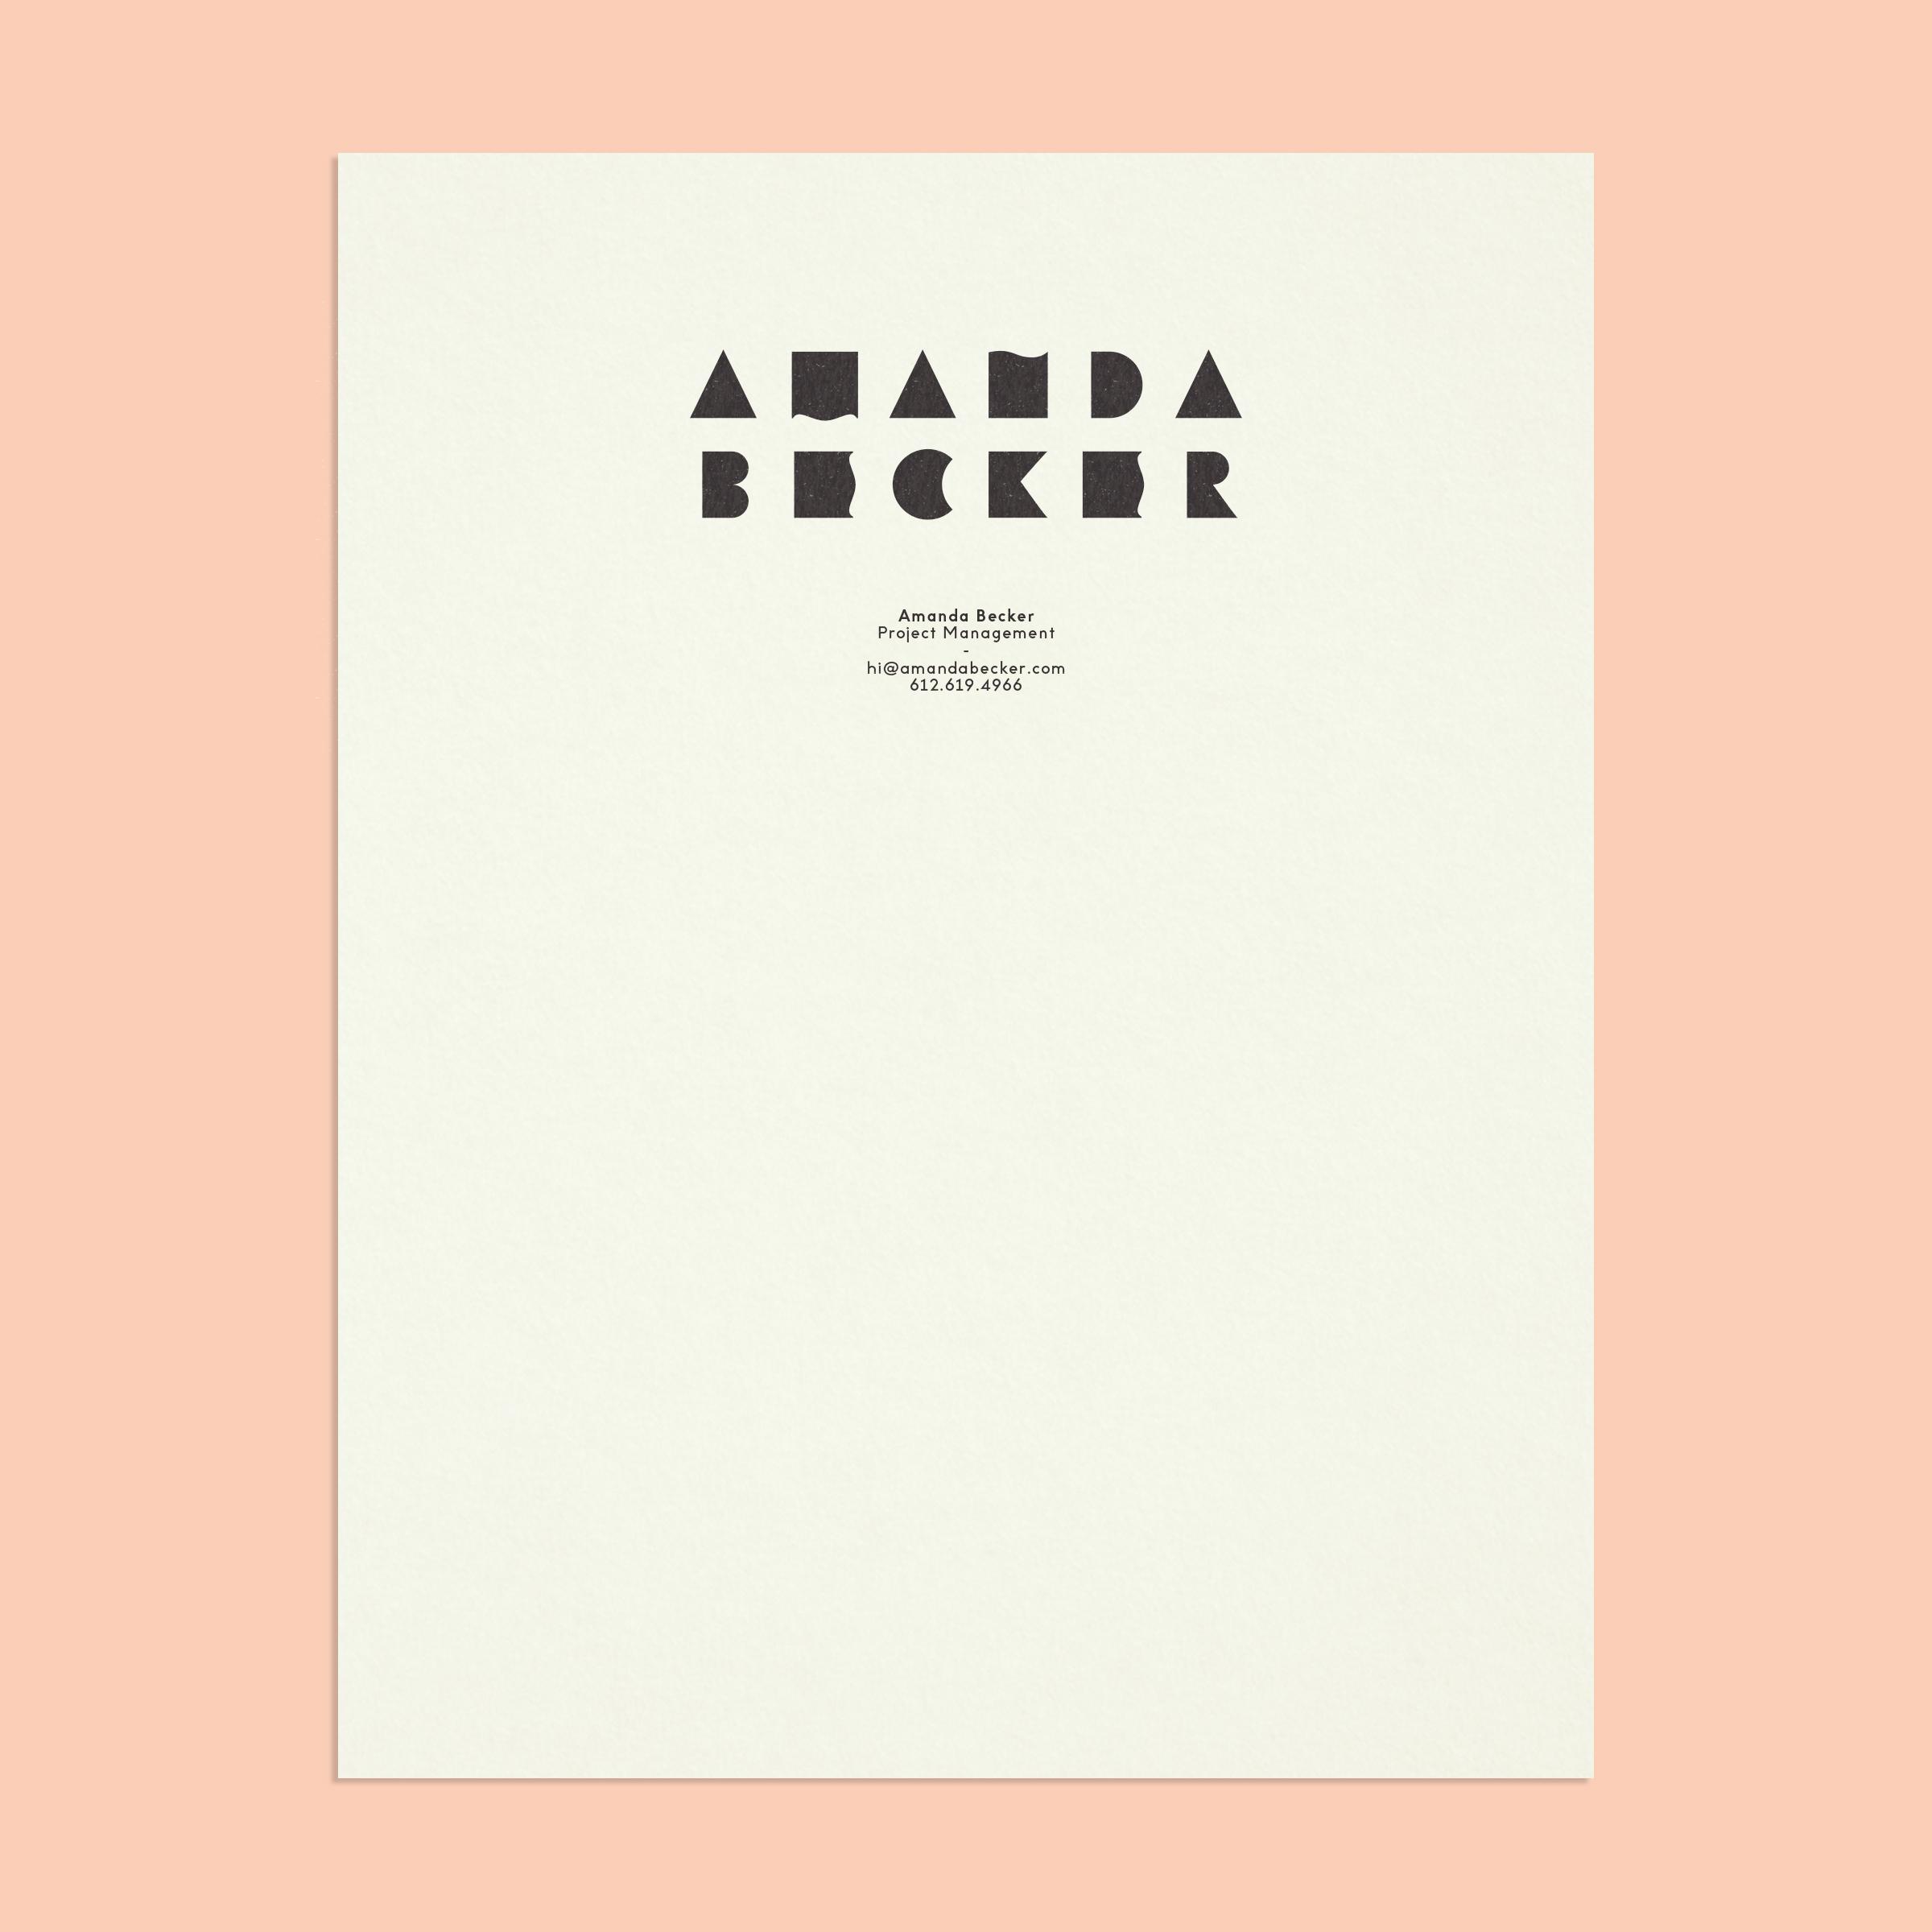 Amanda Becker identity